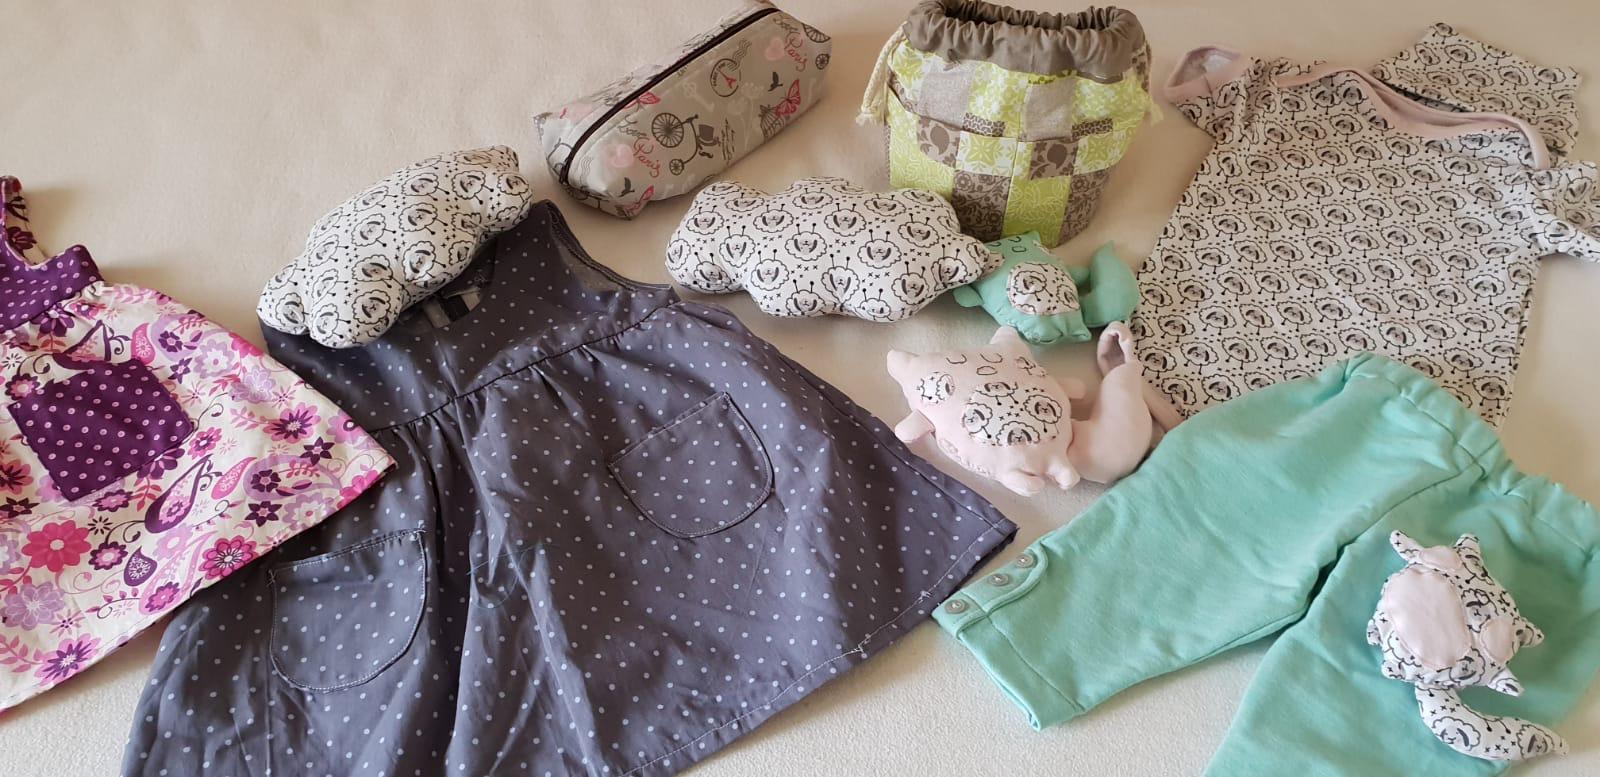 Textildesign (2)